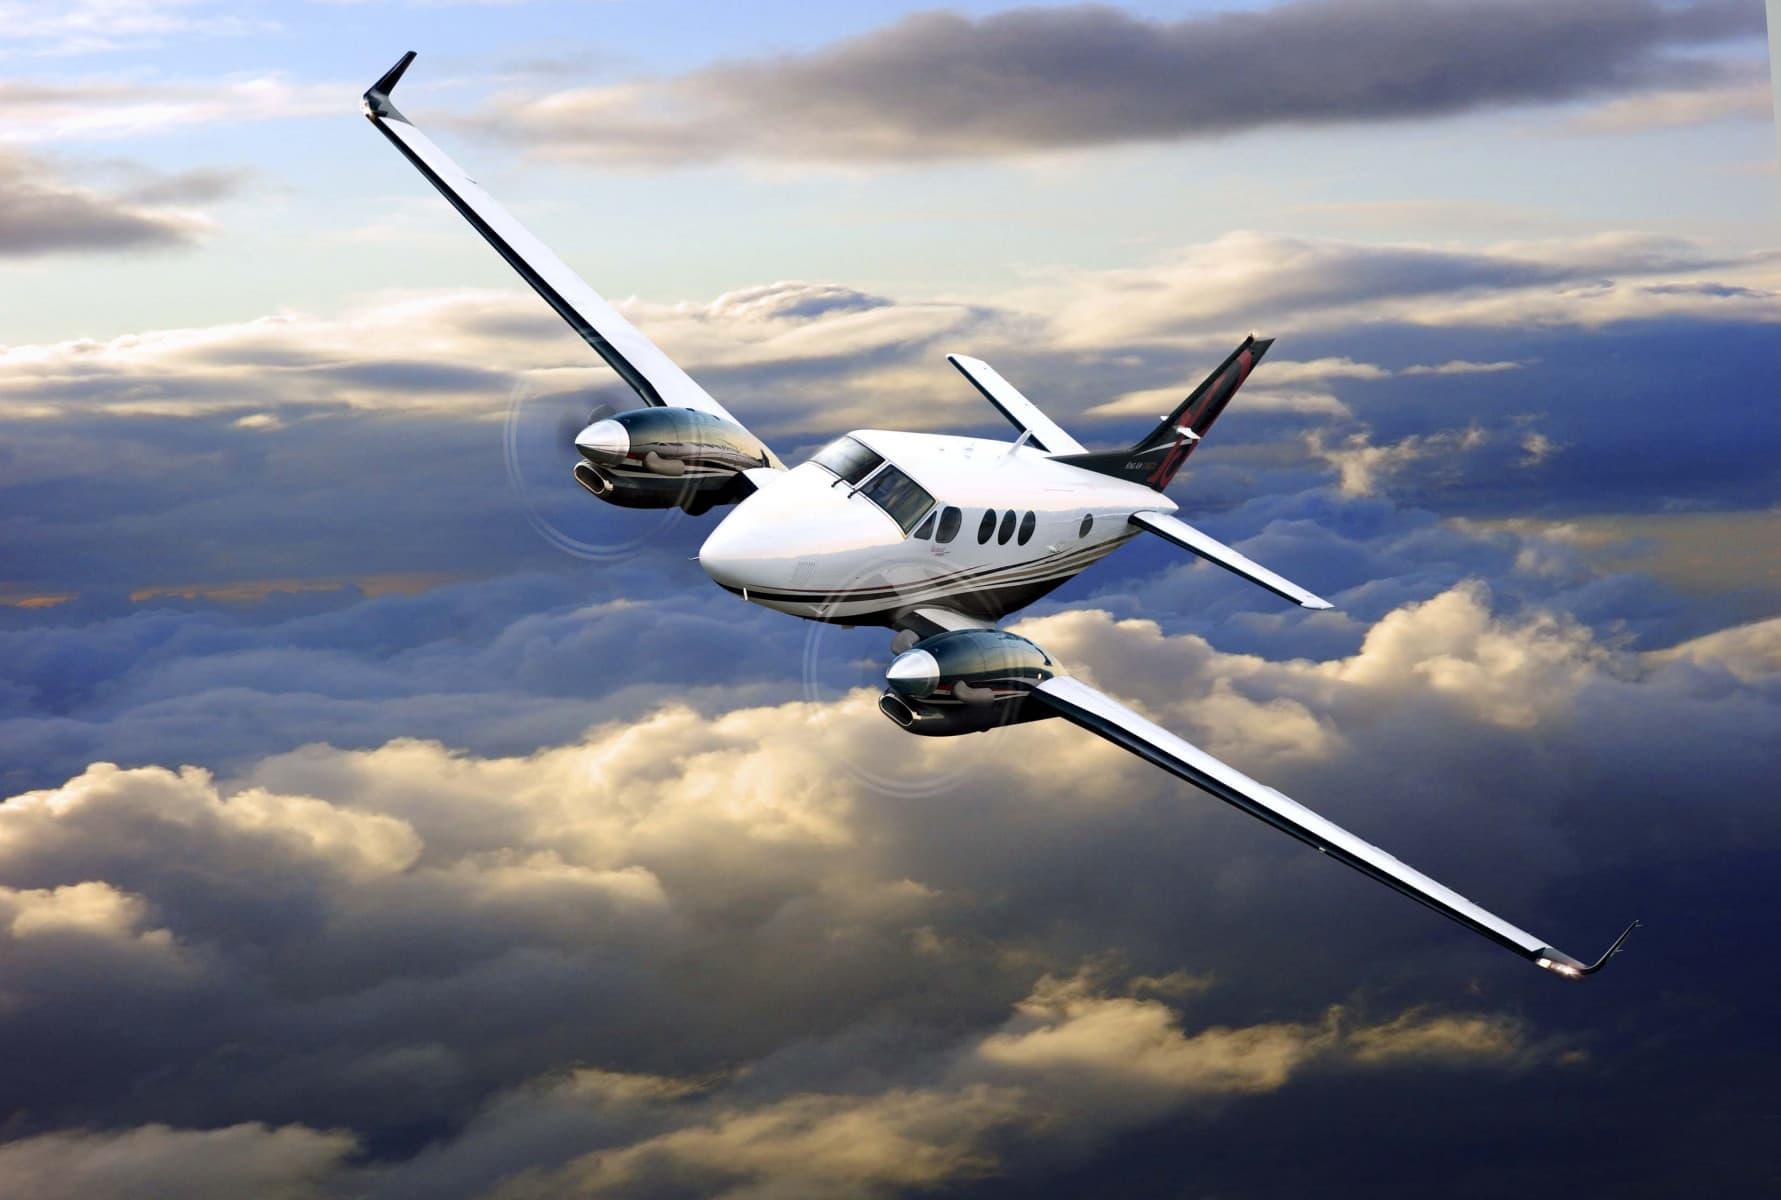 Beechcraft King Air C90GTx